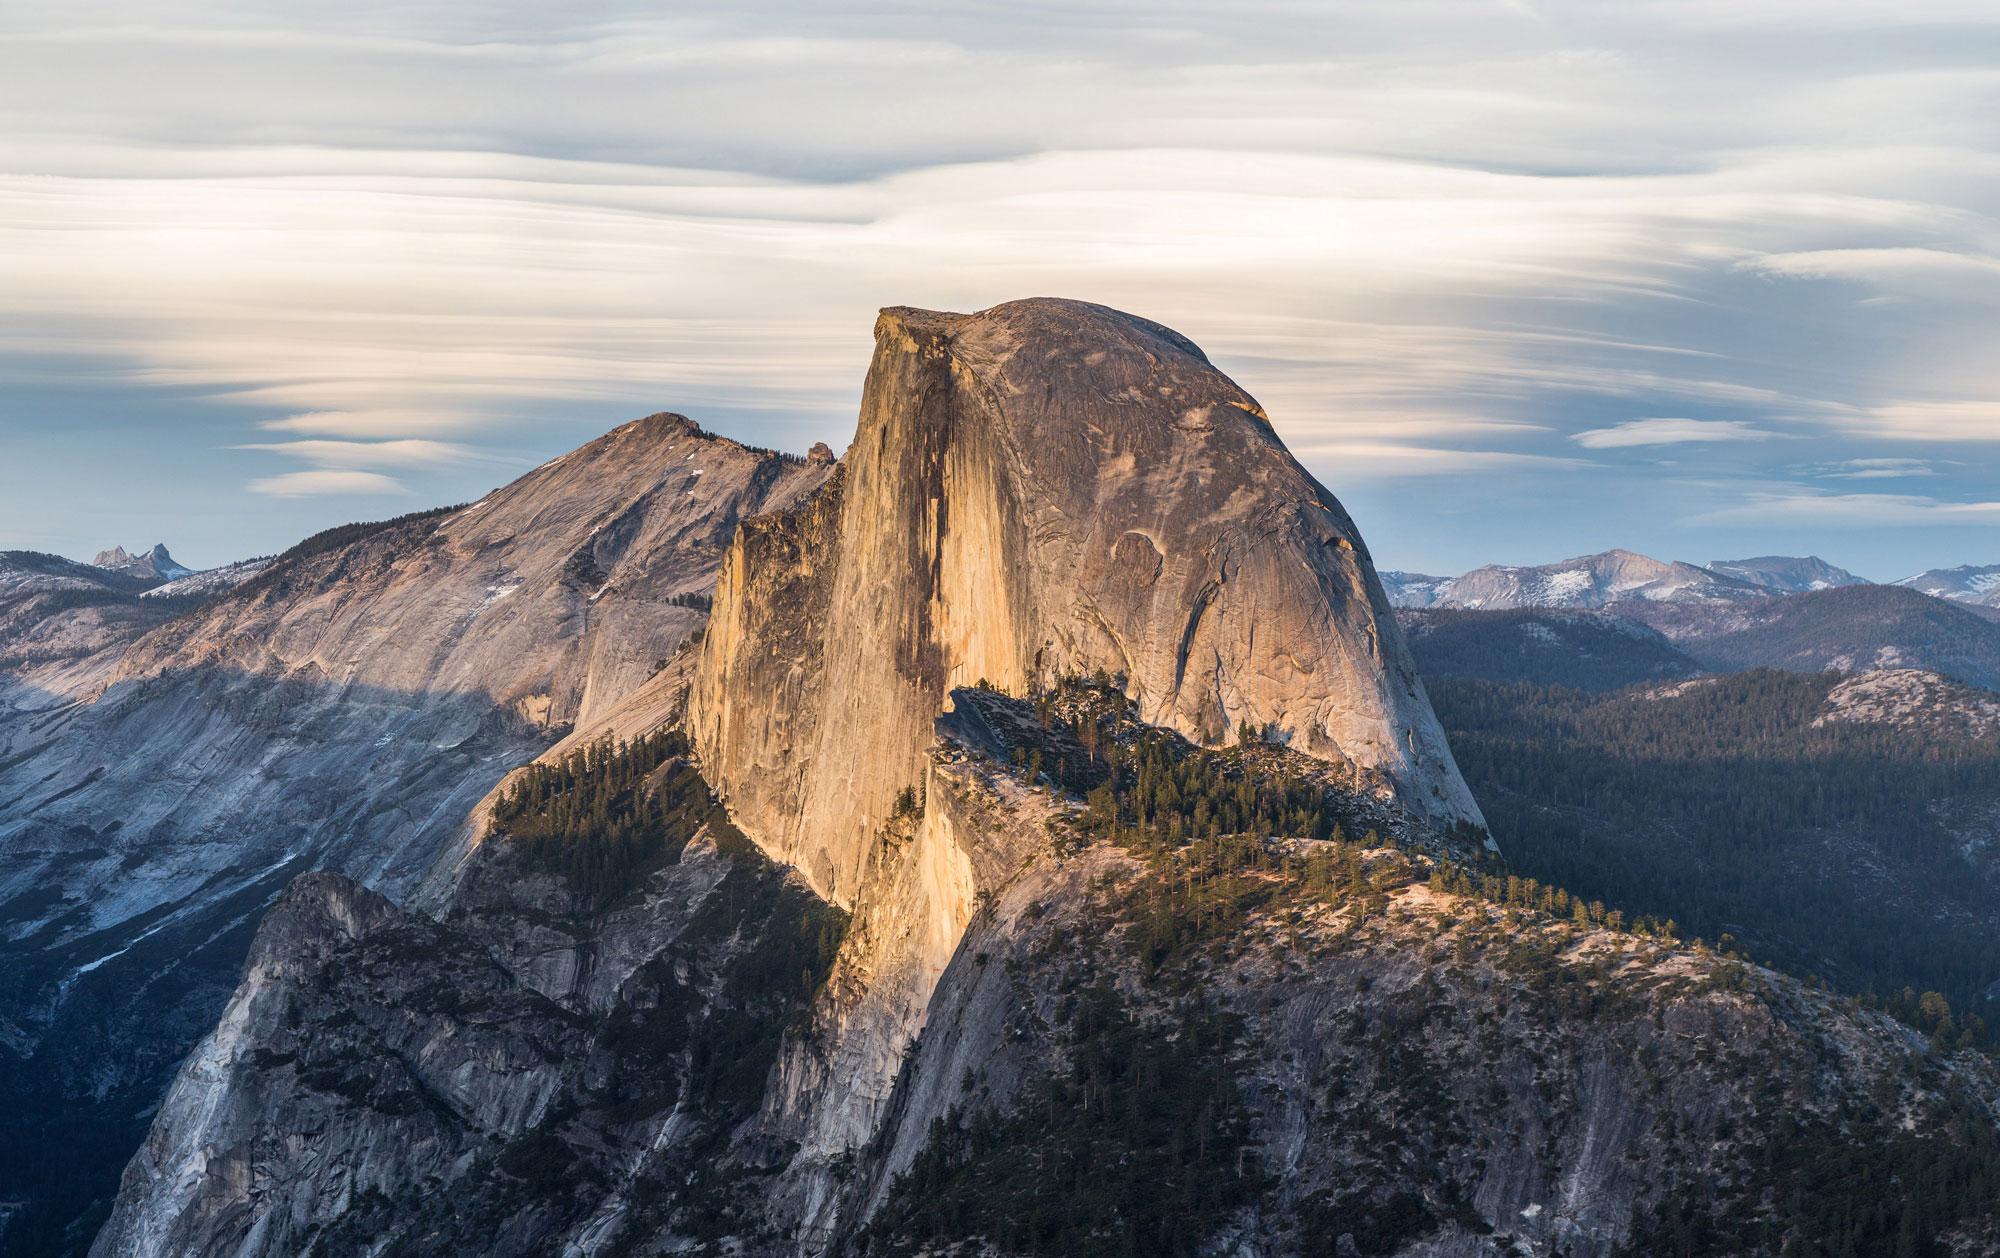 Half Dome (Tisayac), Yosemite National Park, California, Miwok, Ahwahneechee, Paiute and Mono lands. [Photo] David Iliff. License: CC BY-SA 3.0, Wikimedia